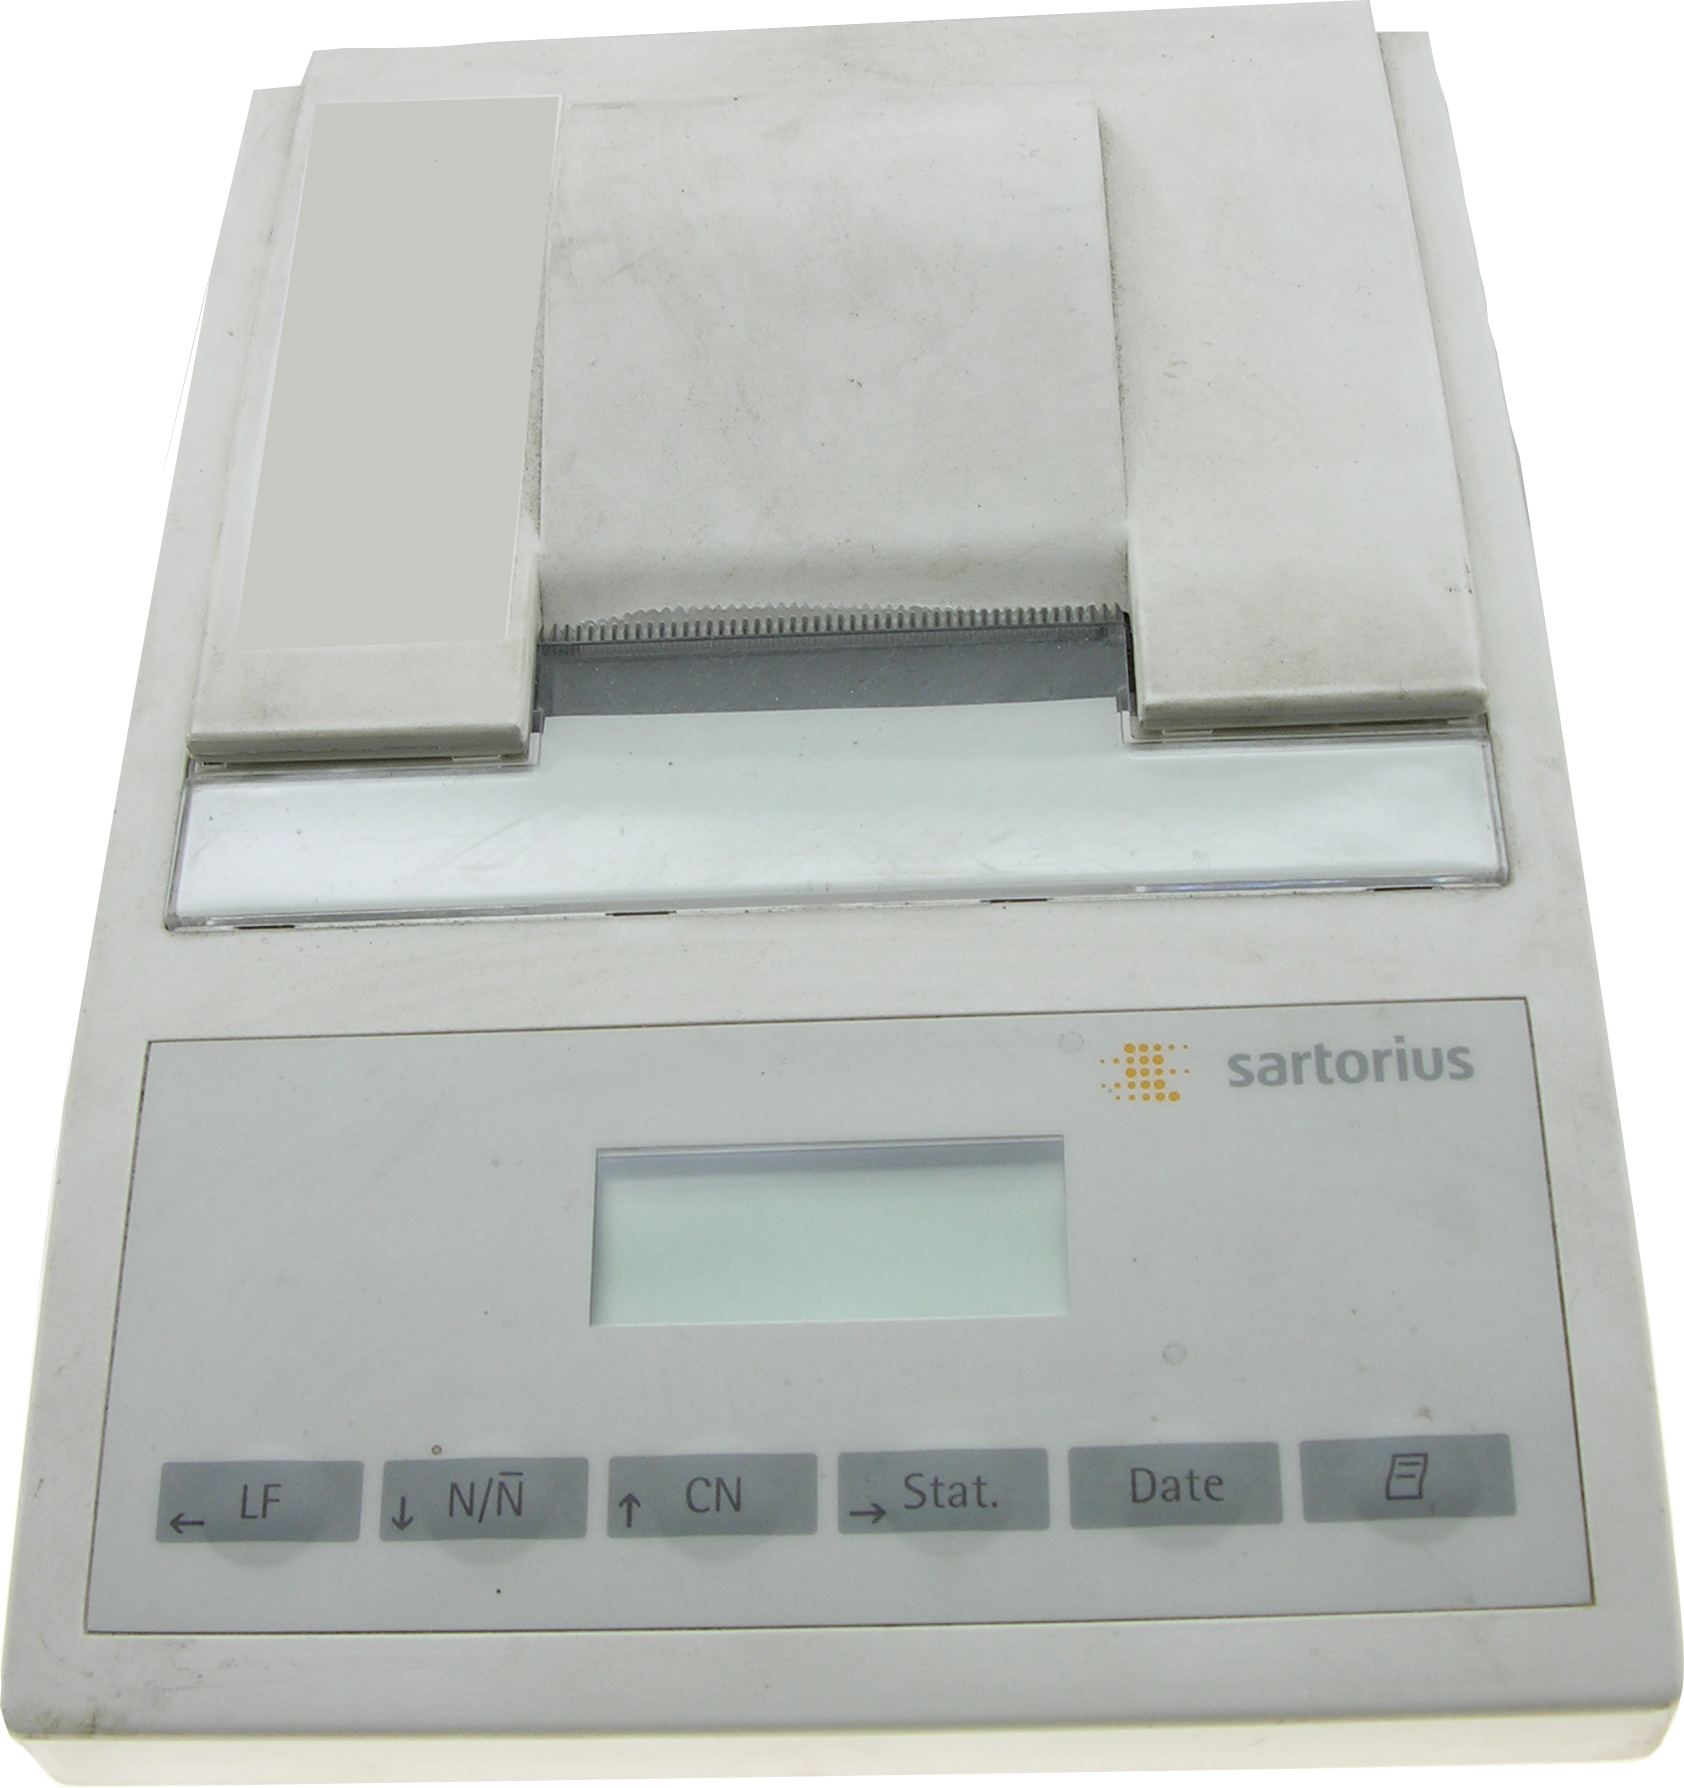 balance industrielle sartorius